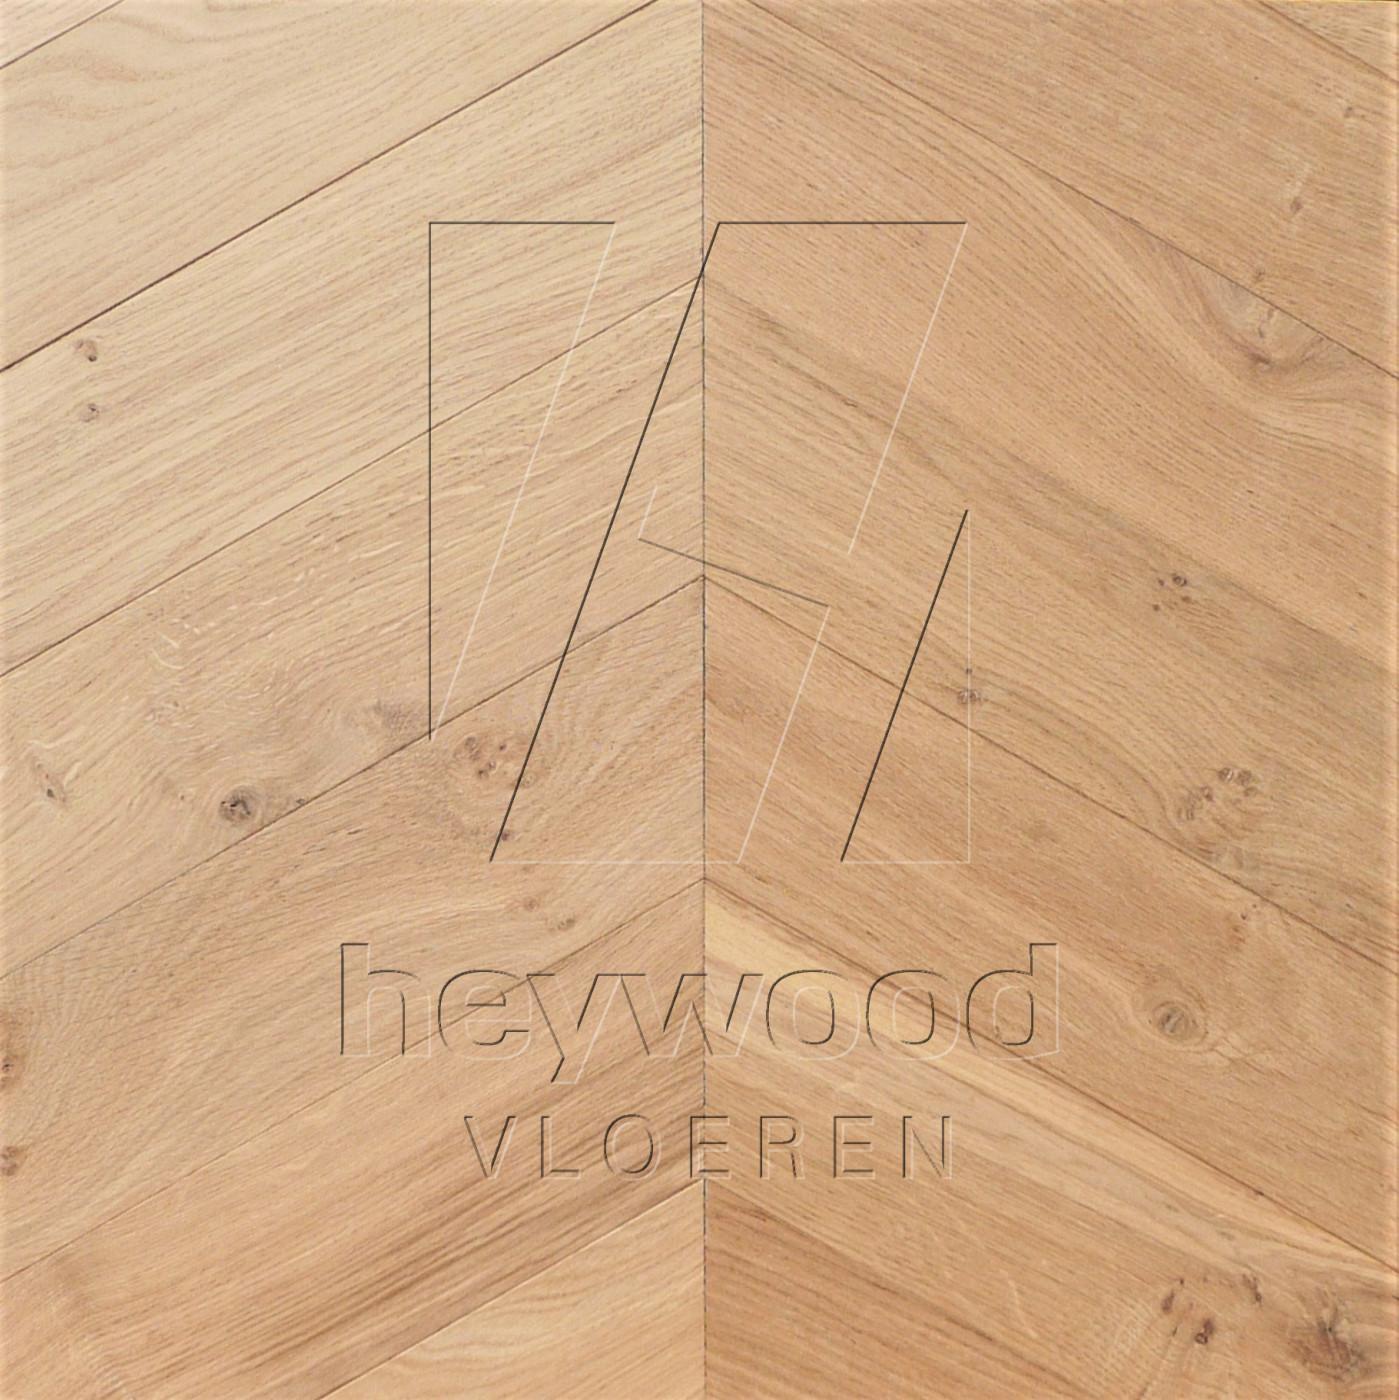 'Virgin Oiled' Chevron 60°, Bespoke Character in Chevron of Pattern & Panel Floors